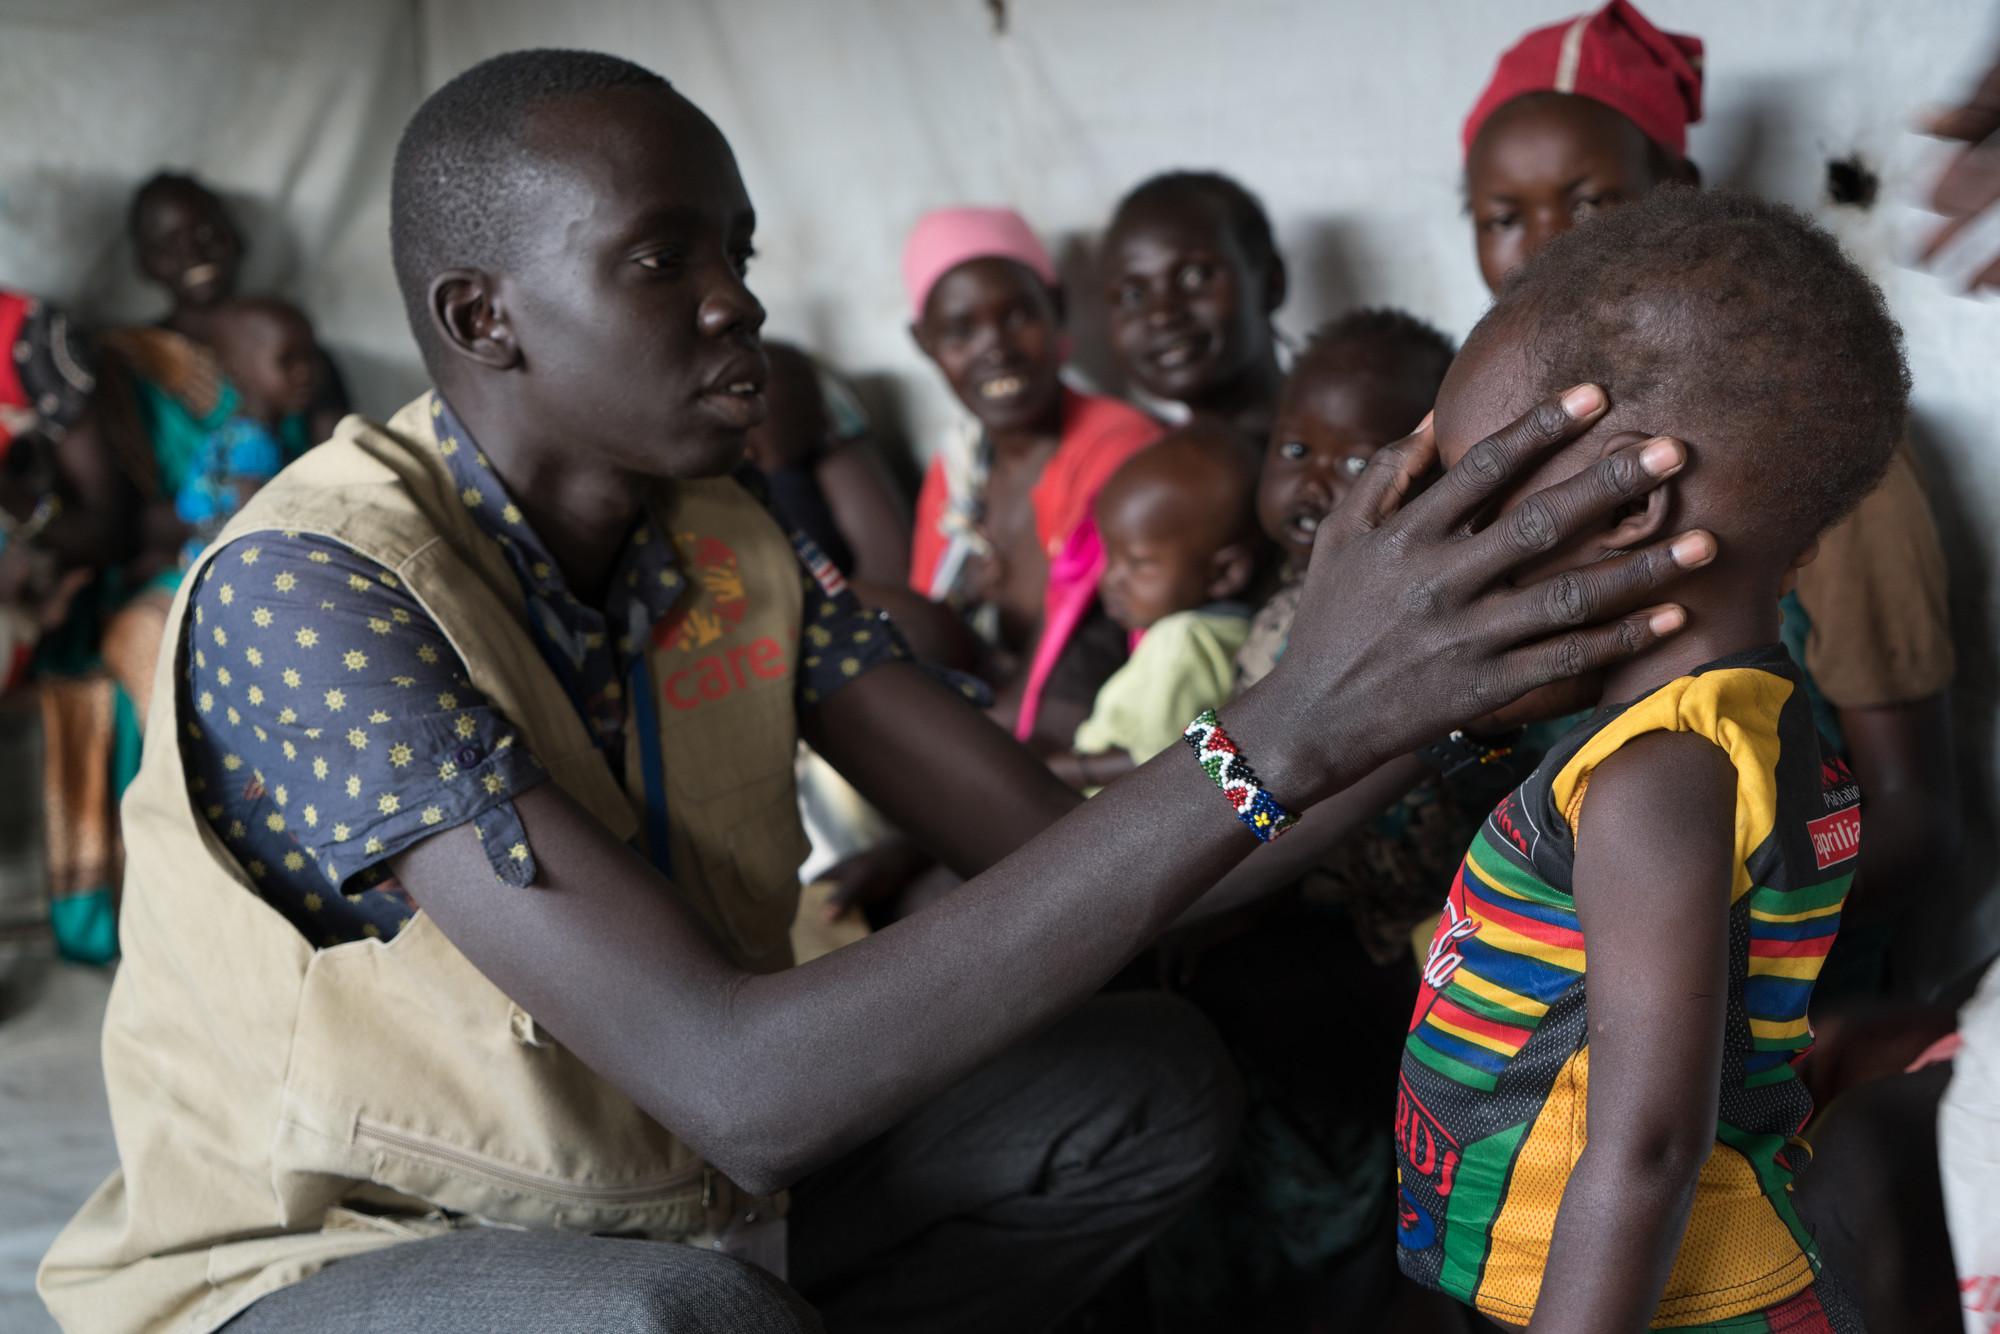 CARE staff in South Sudan check children for malnutrition at the health center.